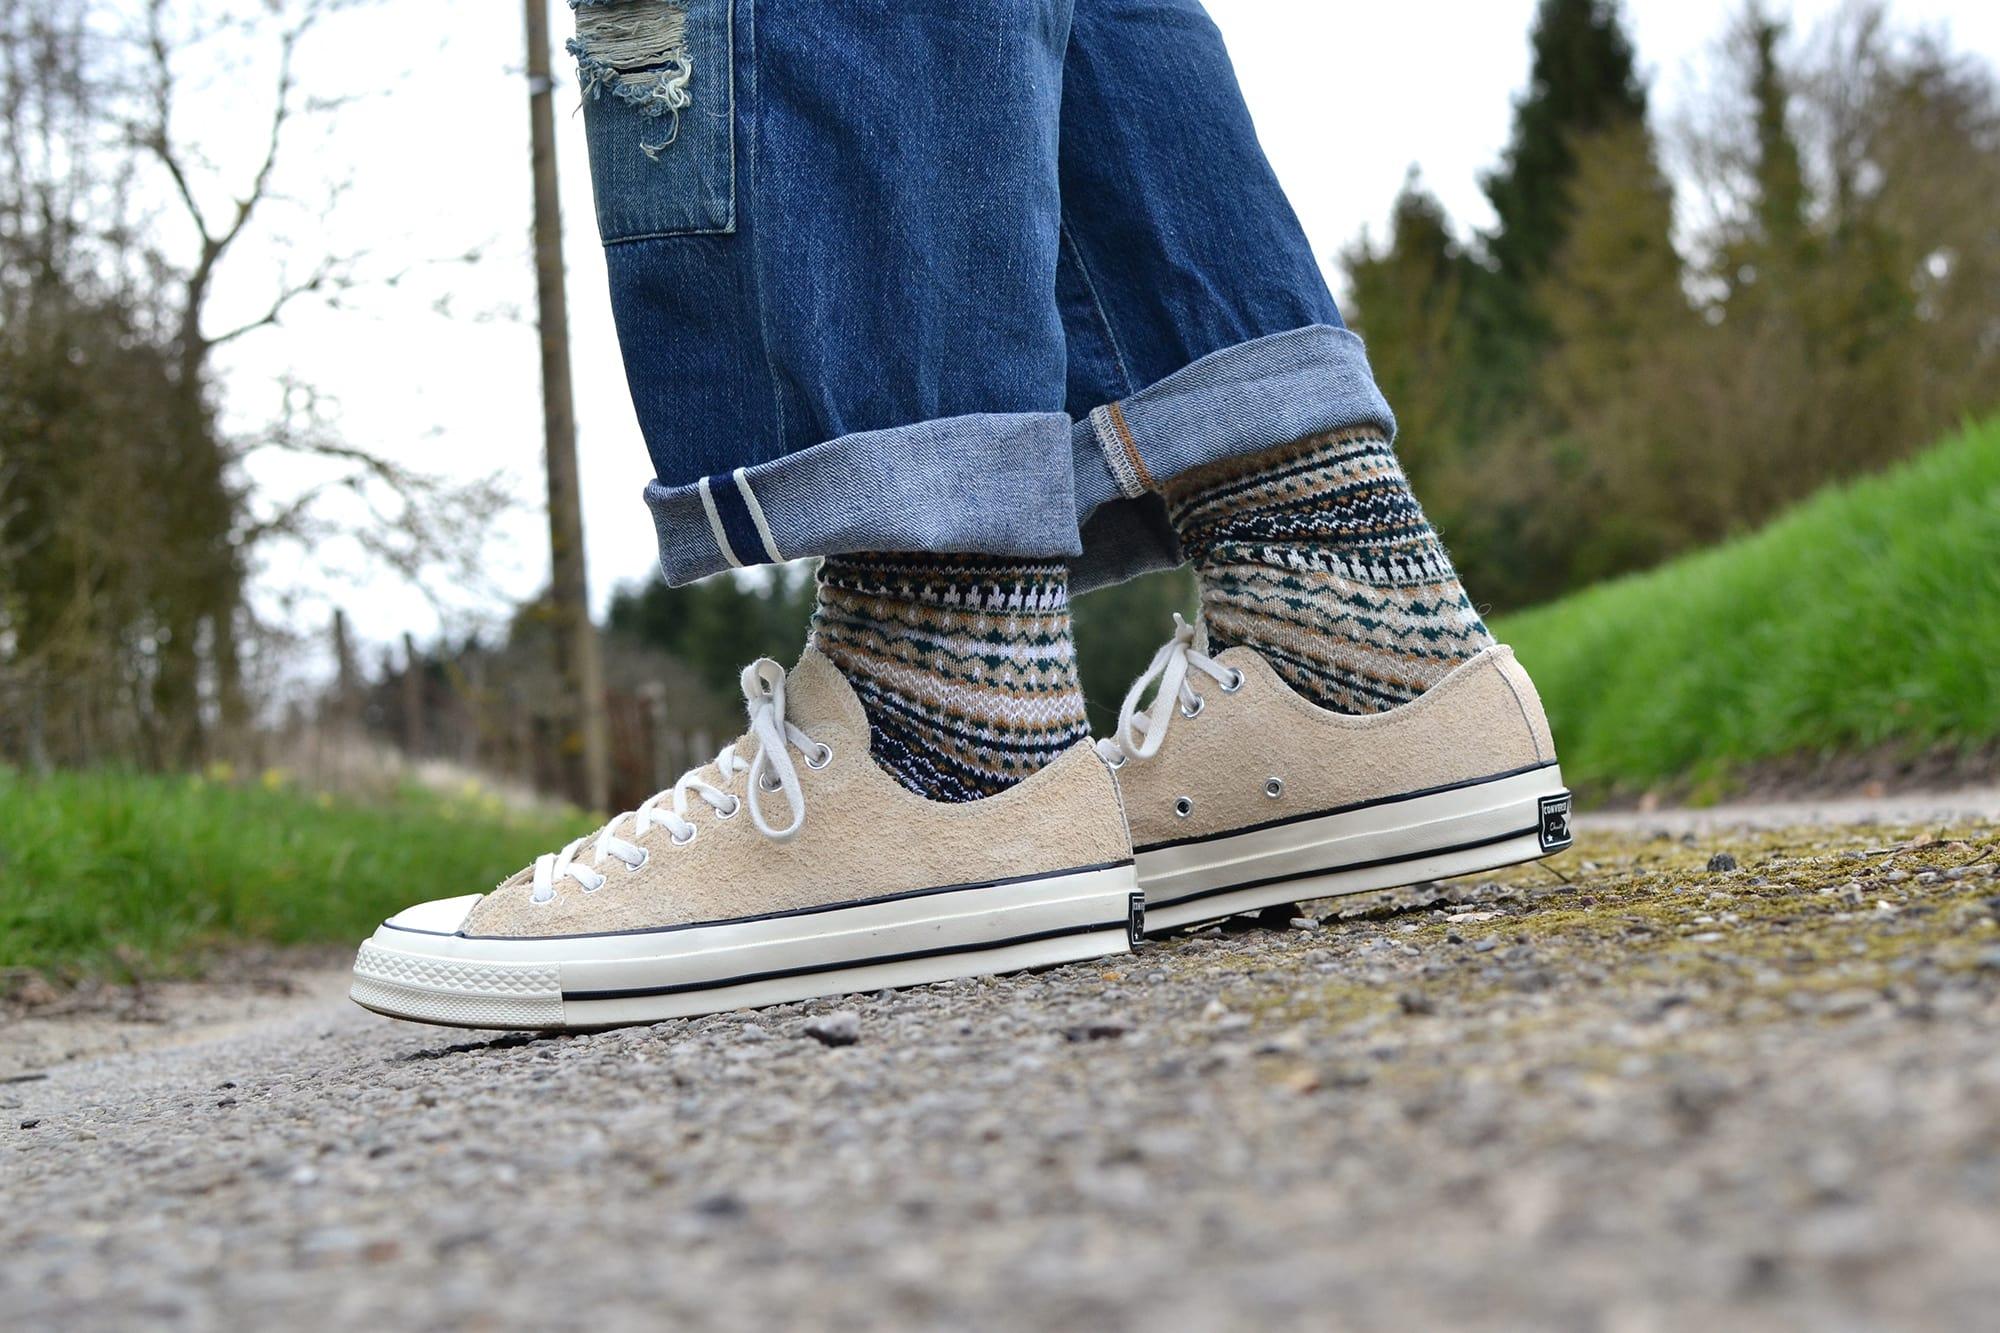 the latest e20d9 37b7c blog mode homme street heritage japan wear – – 15Vetra Work Jacket –  DOckers x Patrik Ervell shirt -Levi s vintage clothing 915 501 big E jeans  – Converse ...